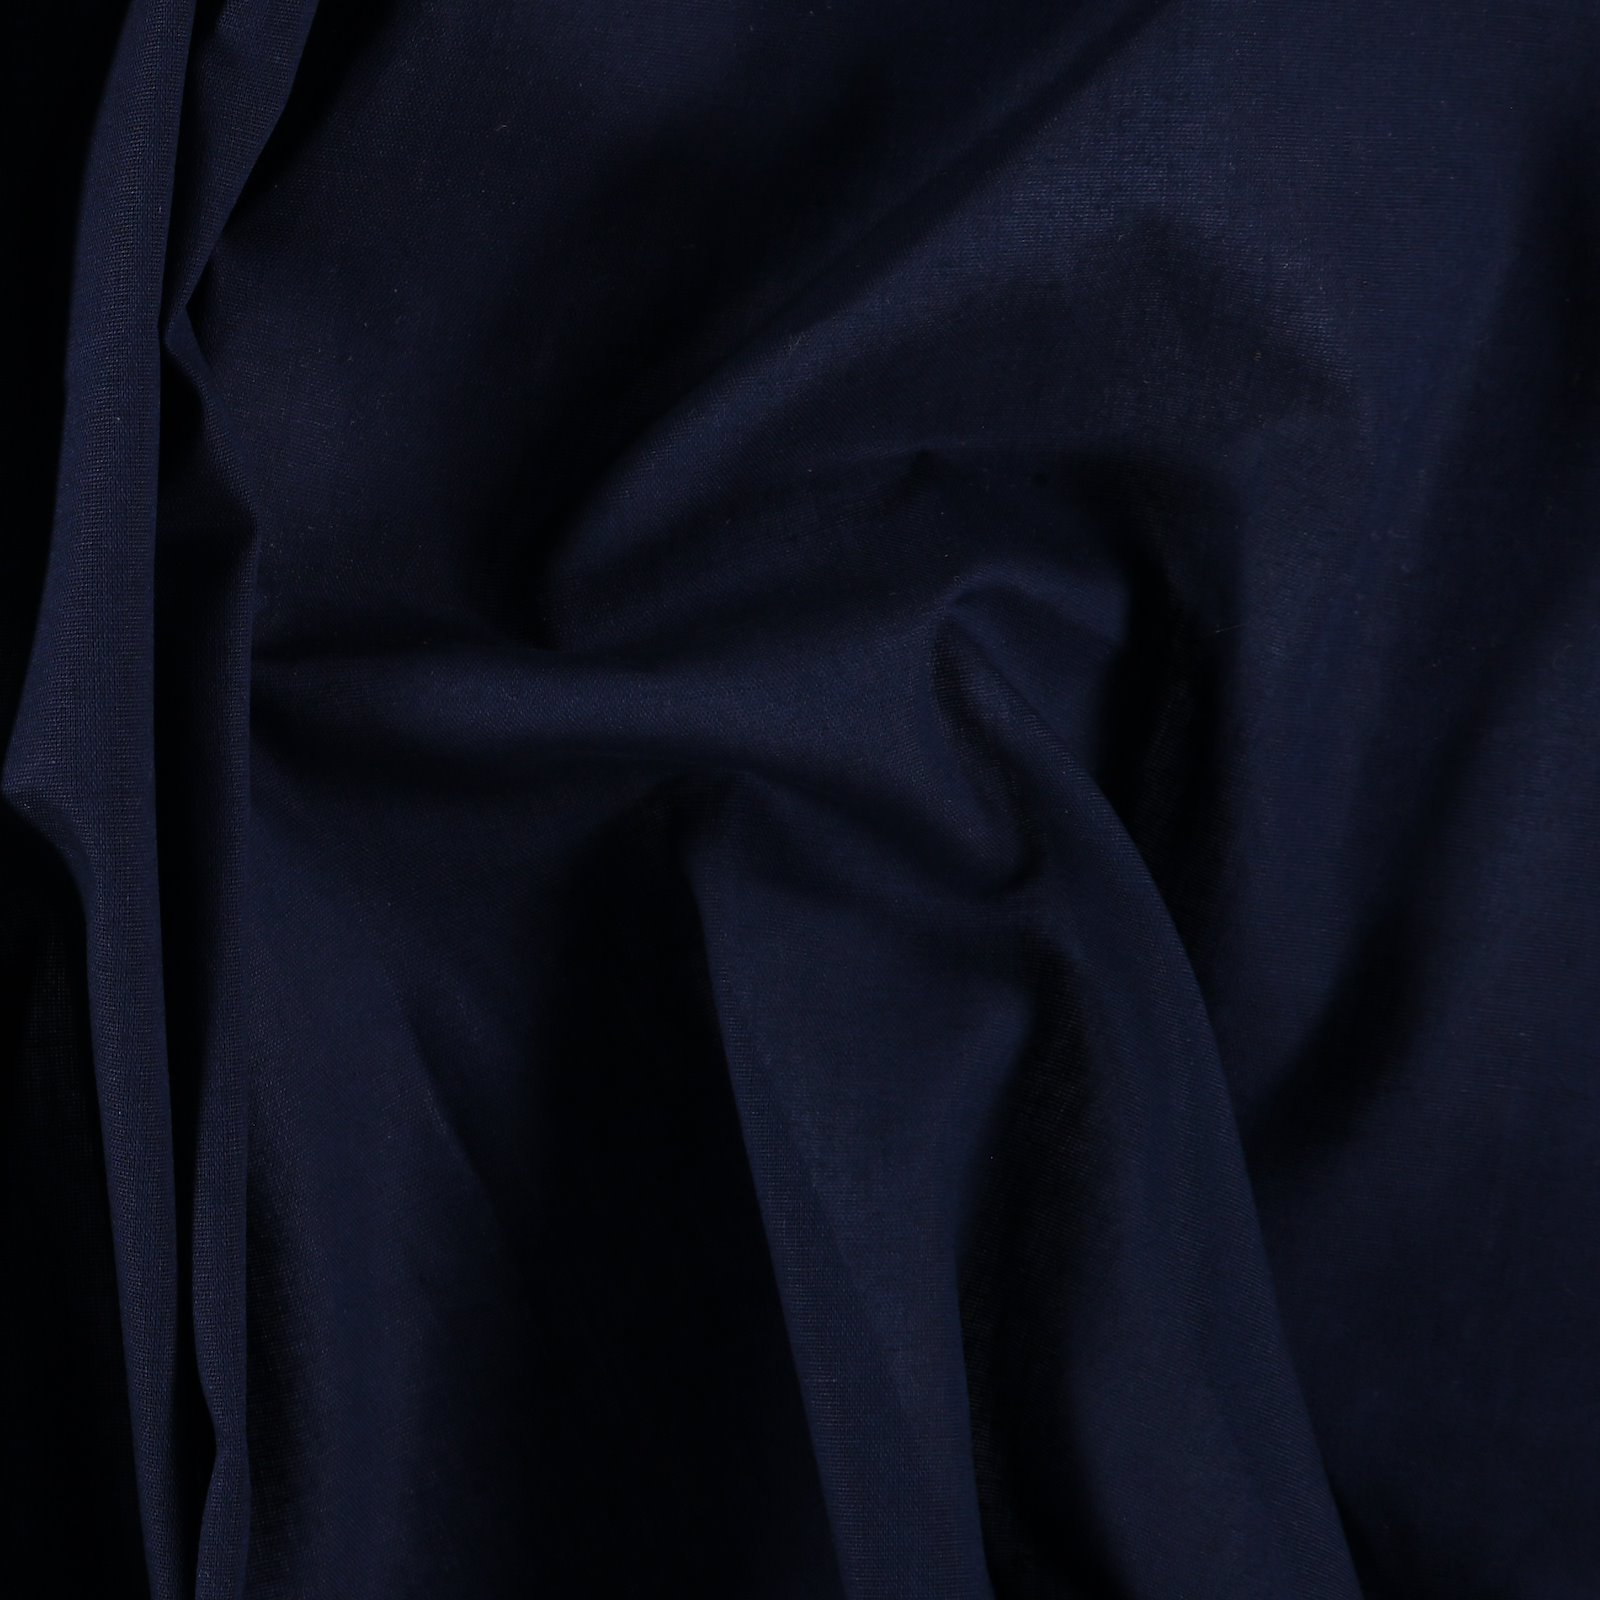 Light woven cotton dark blue